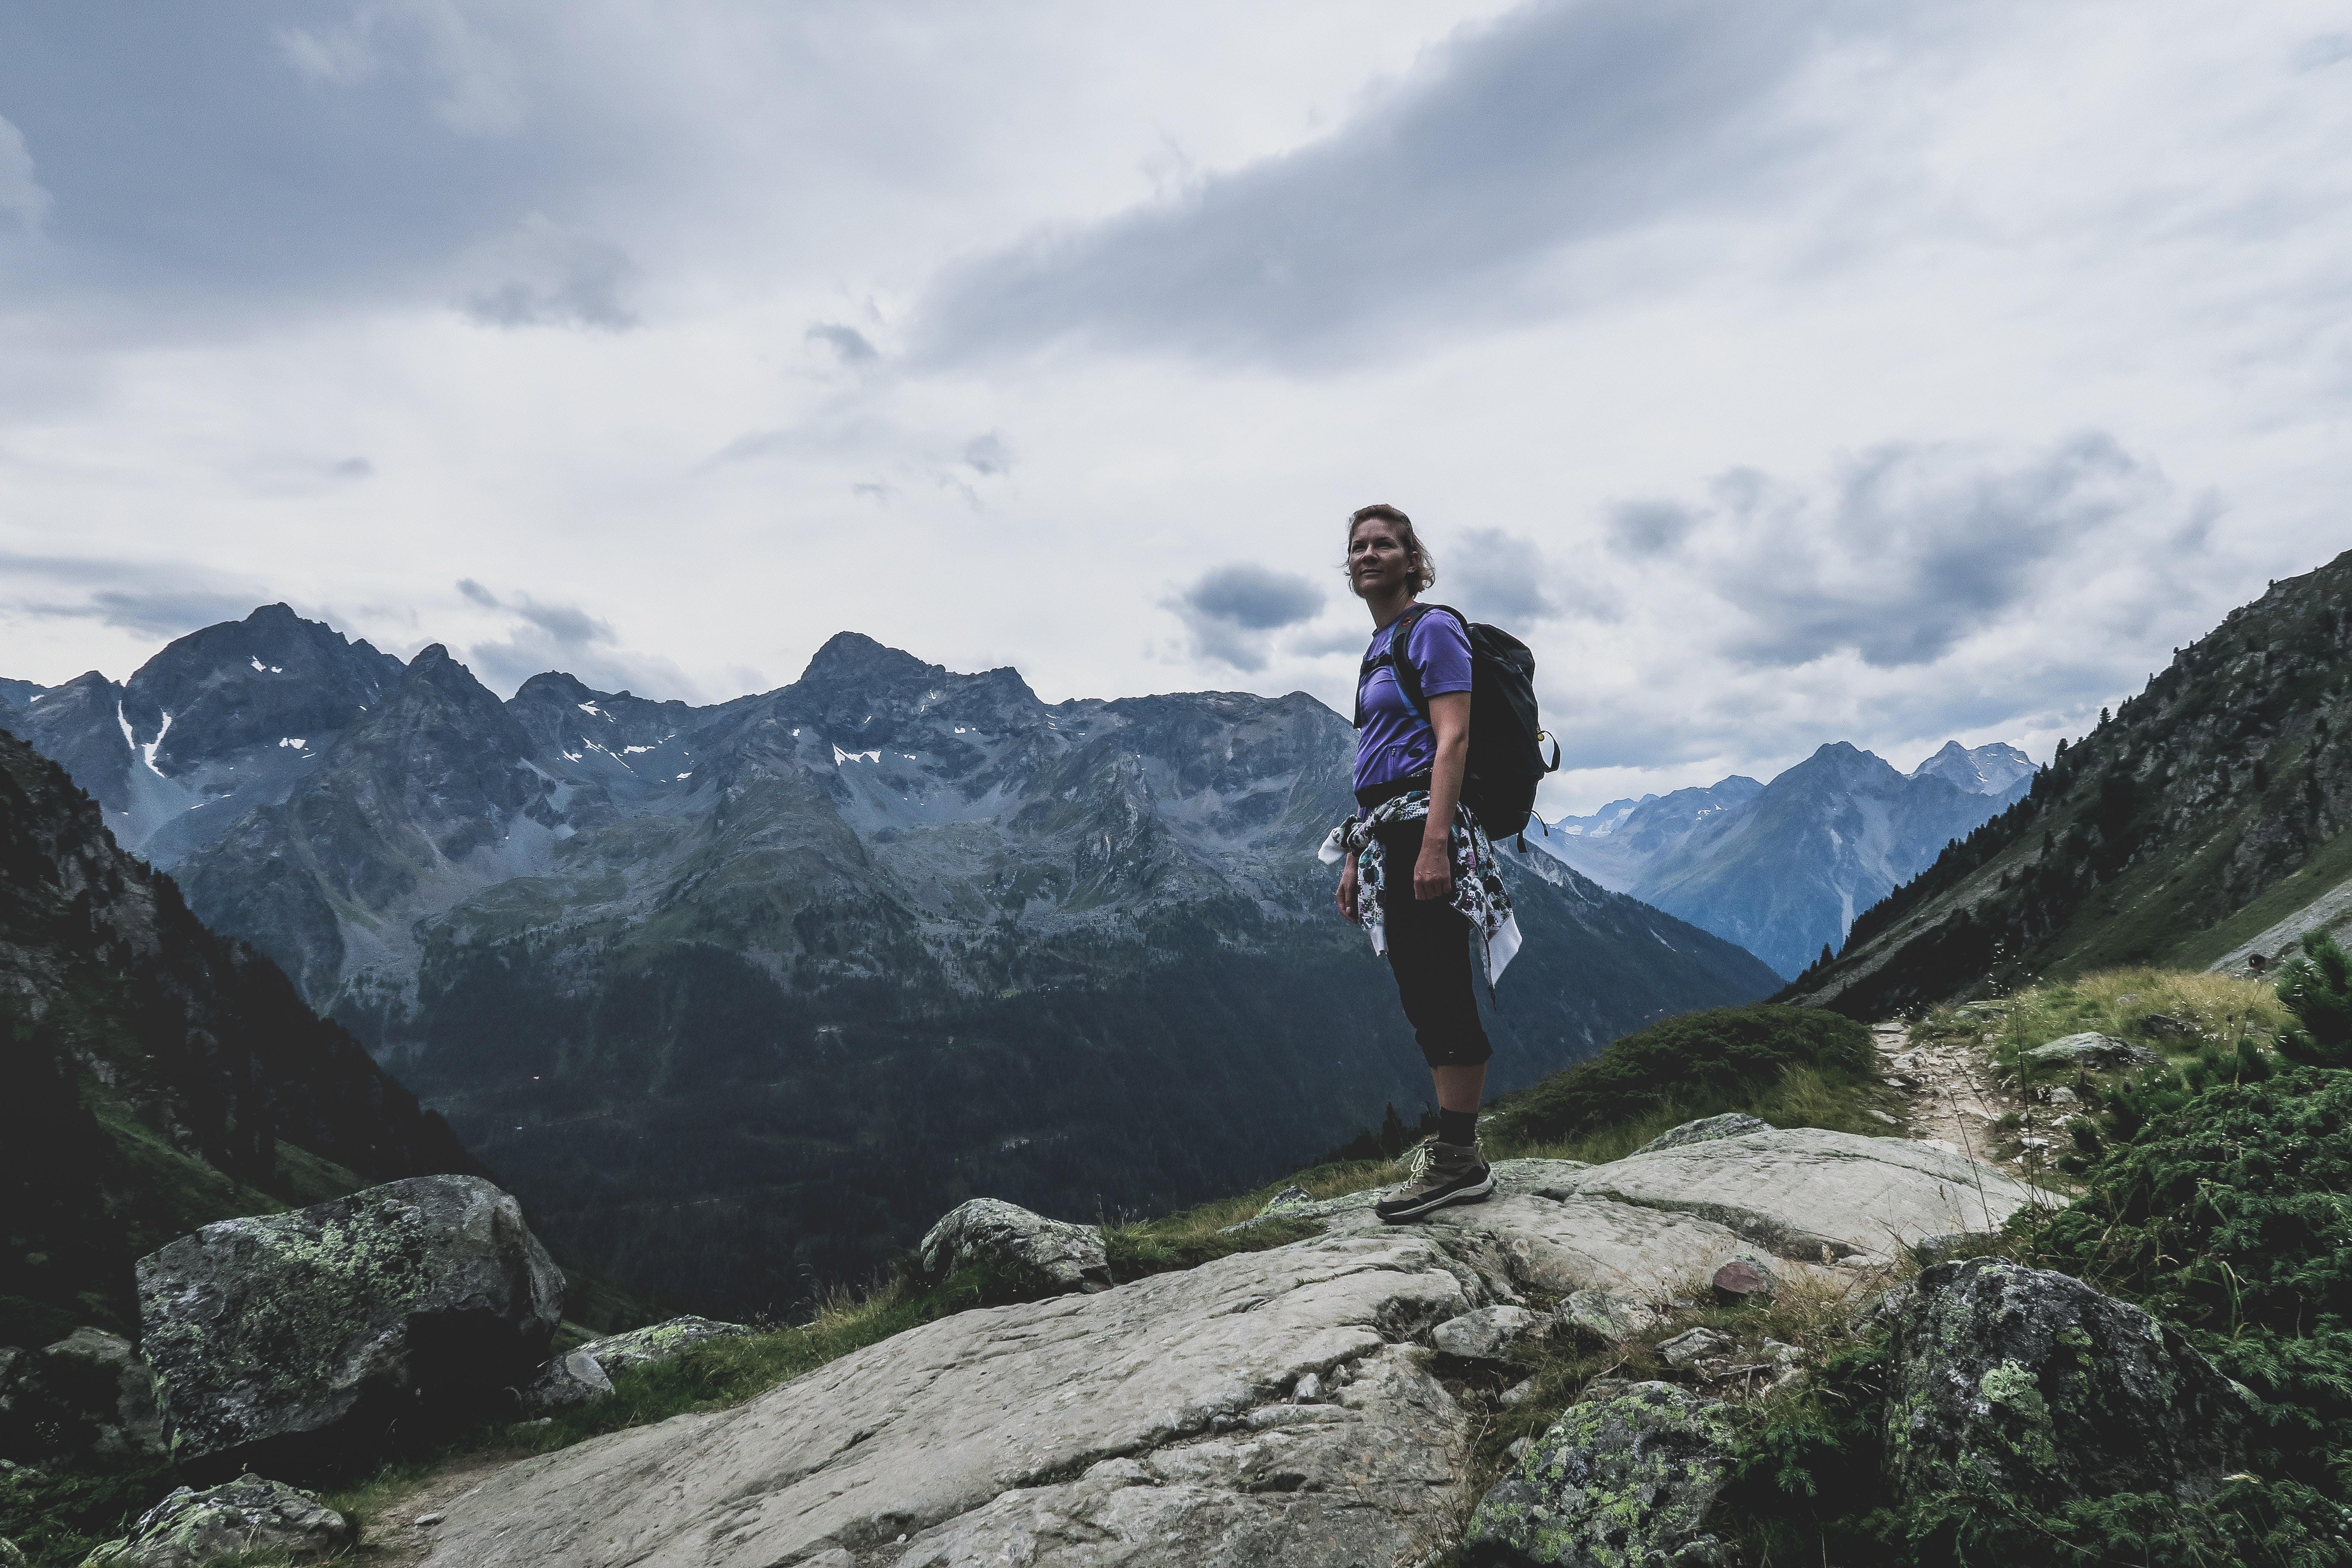 man on cliff mountain